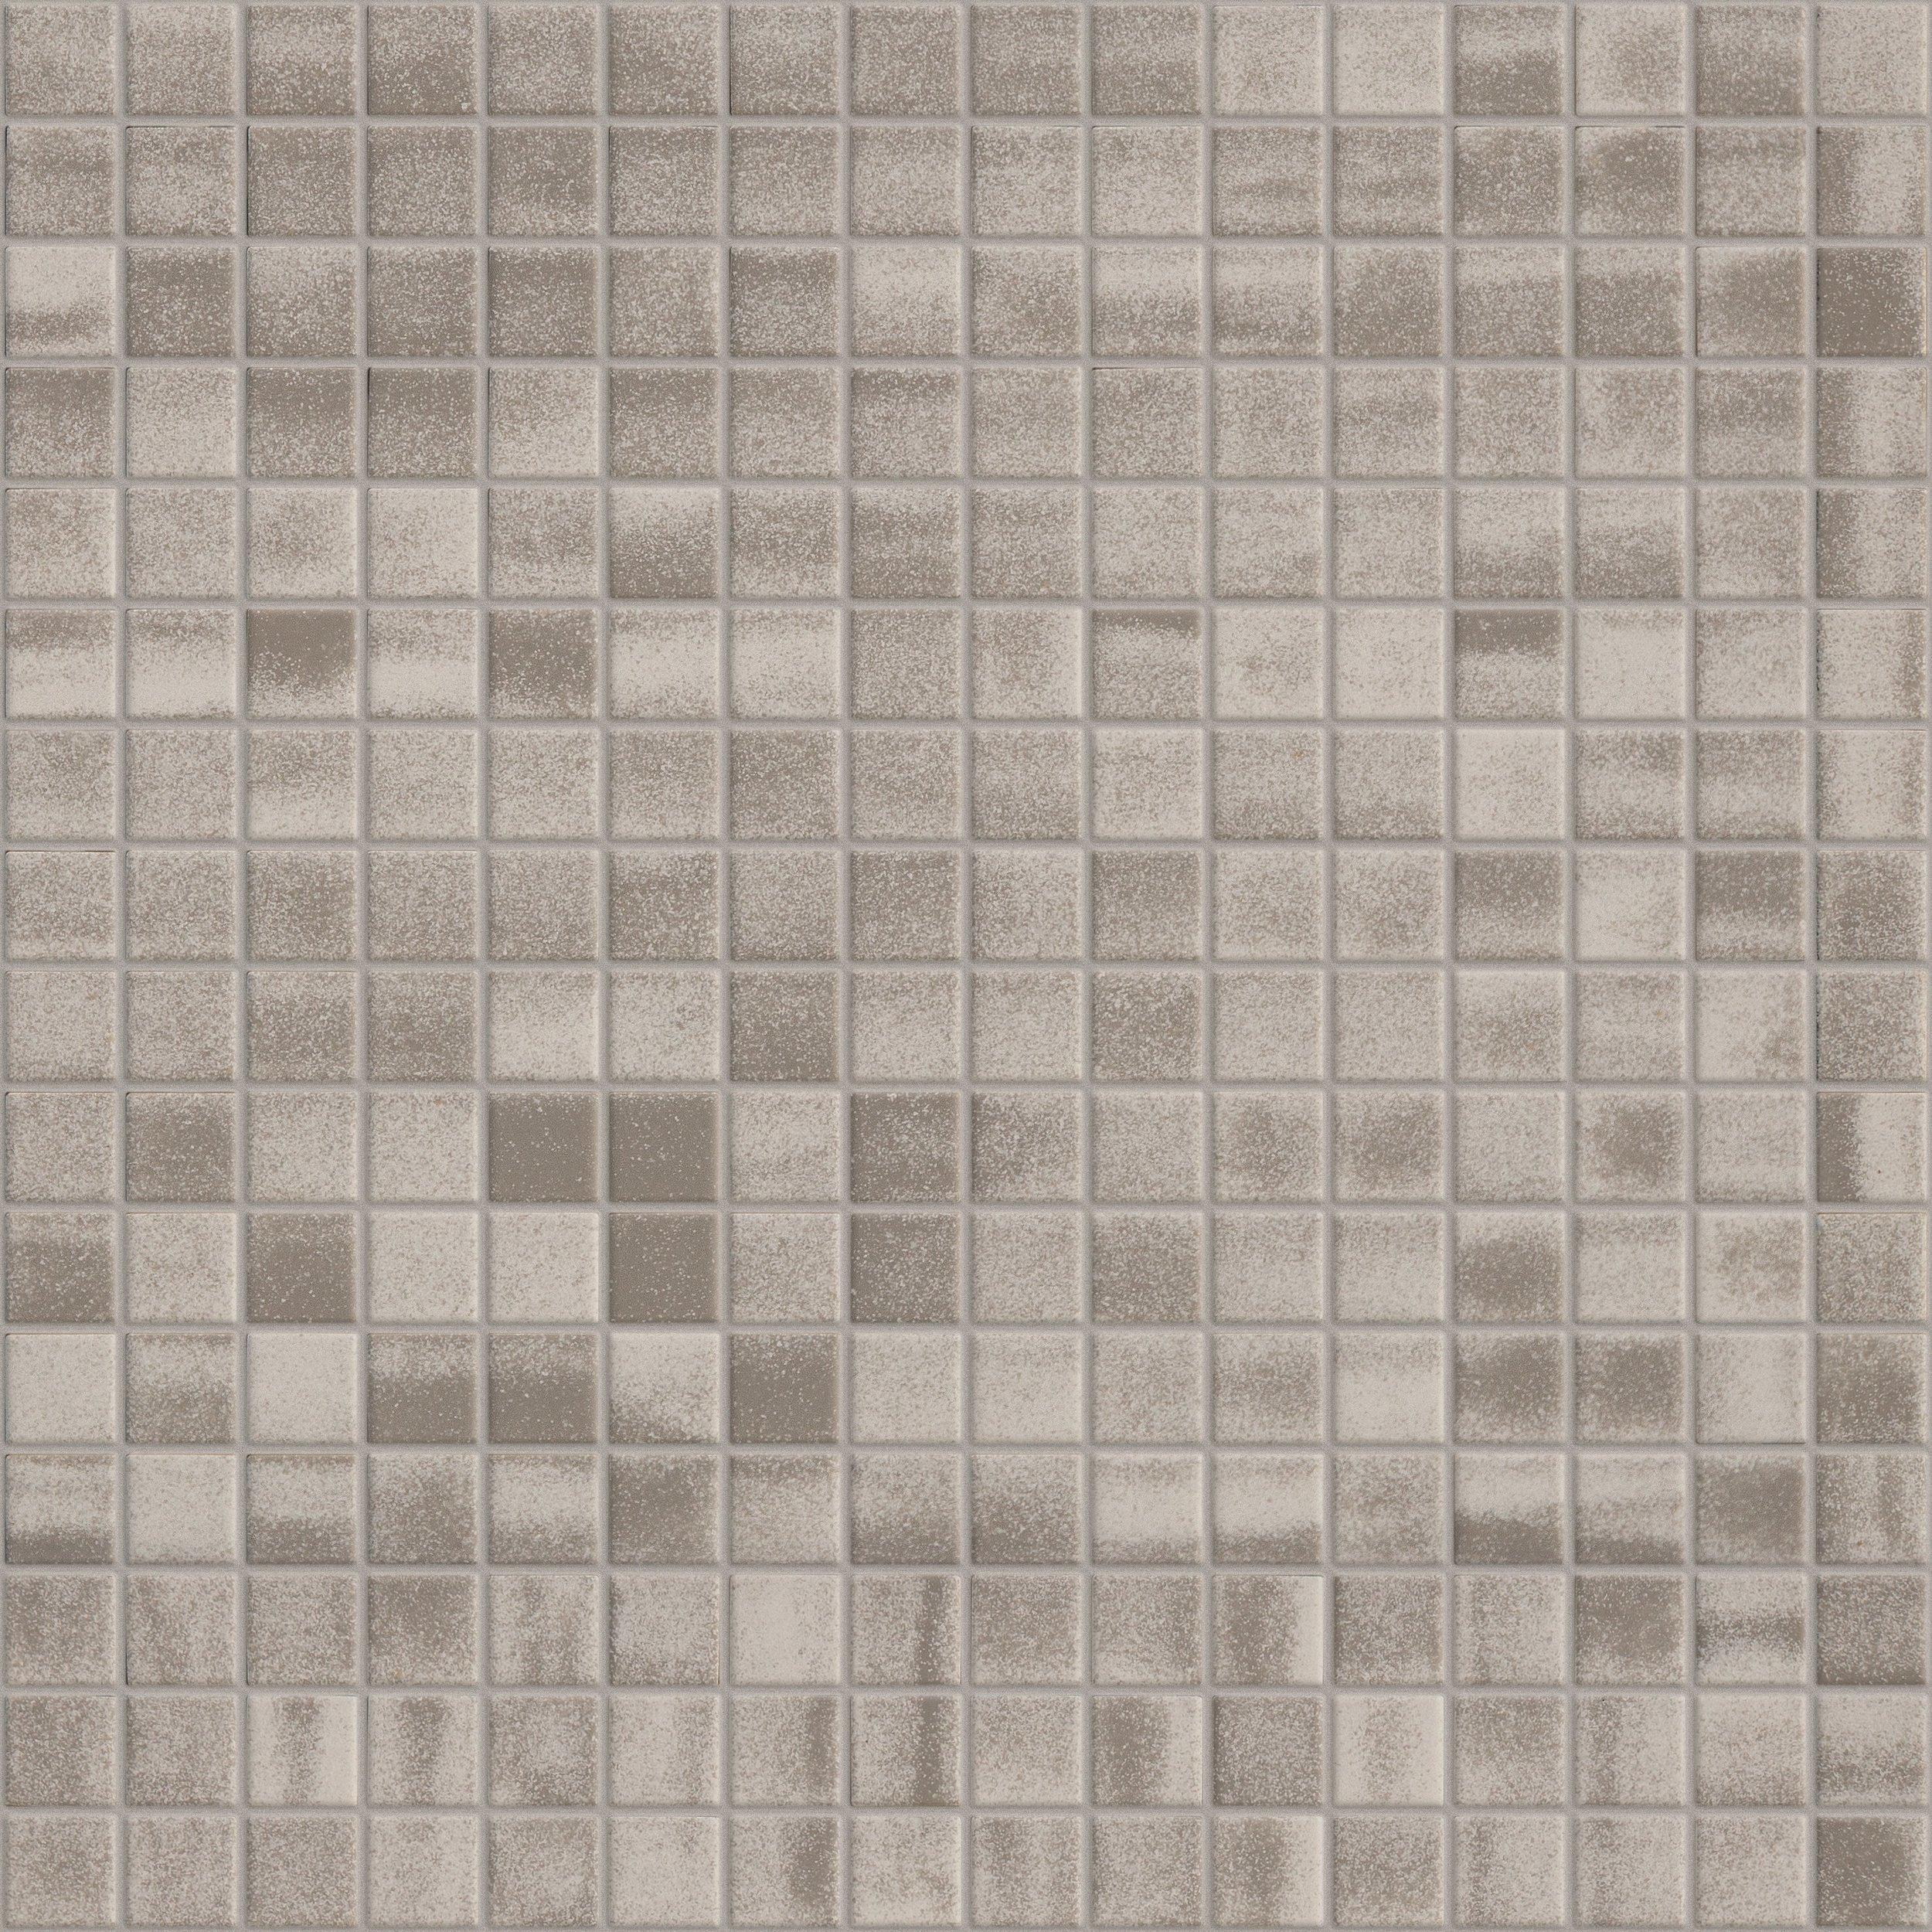 MosaicoMix_White-Grey_FOGLIO.jpg